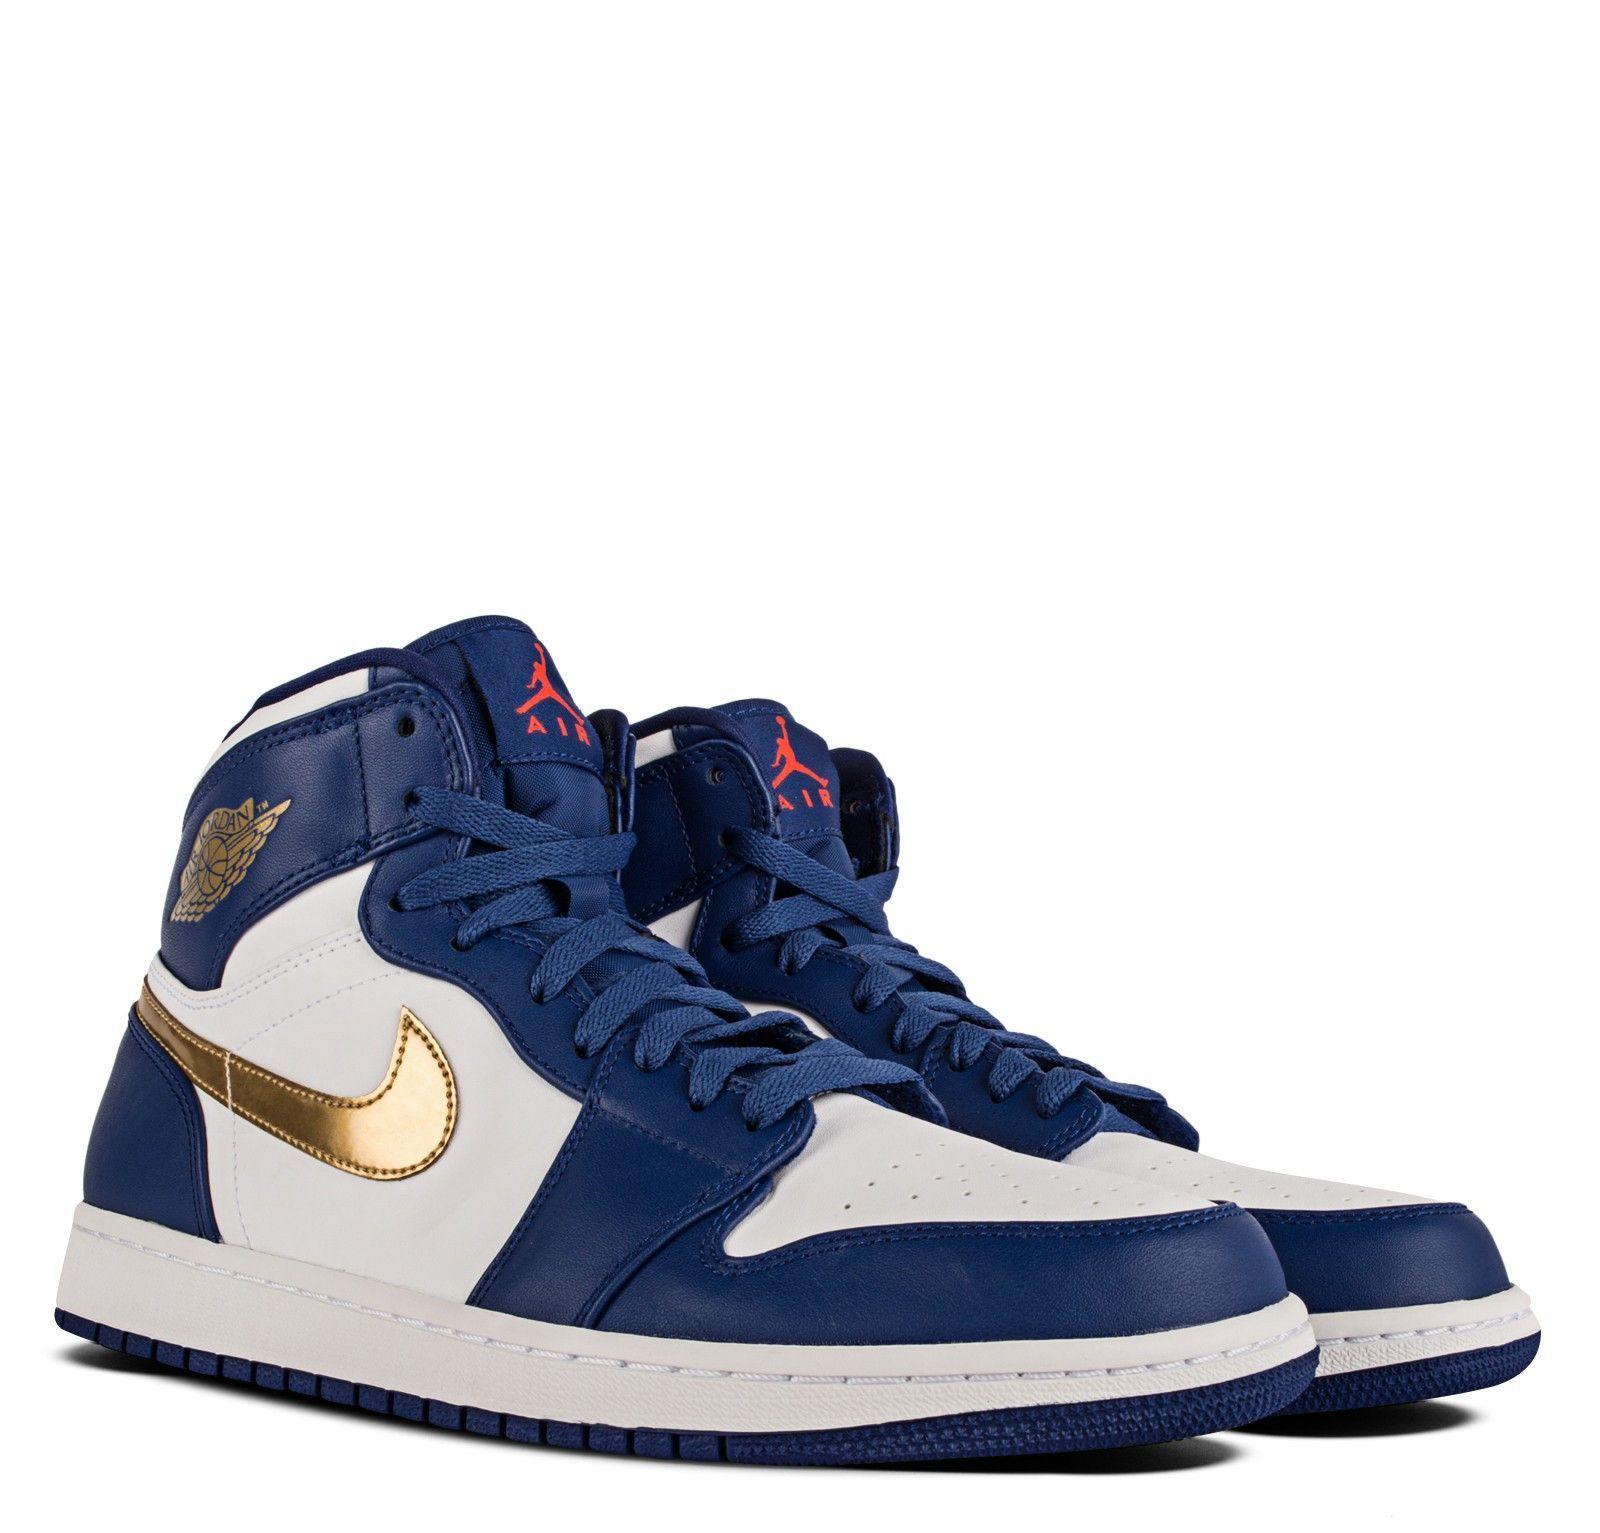 Retro nike shoes, Nike shoes jordans